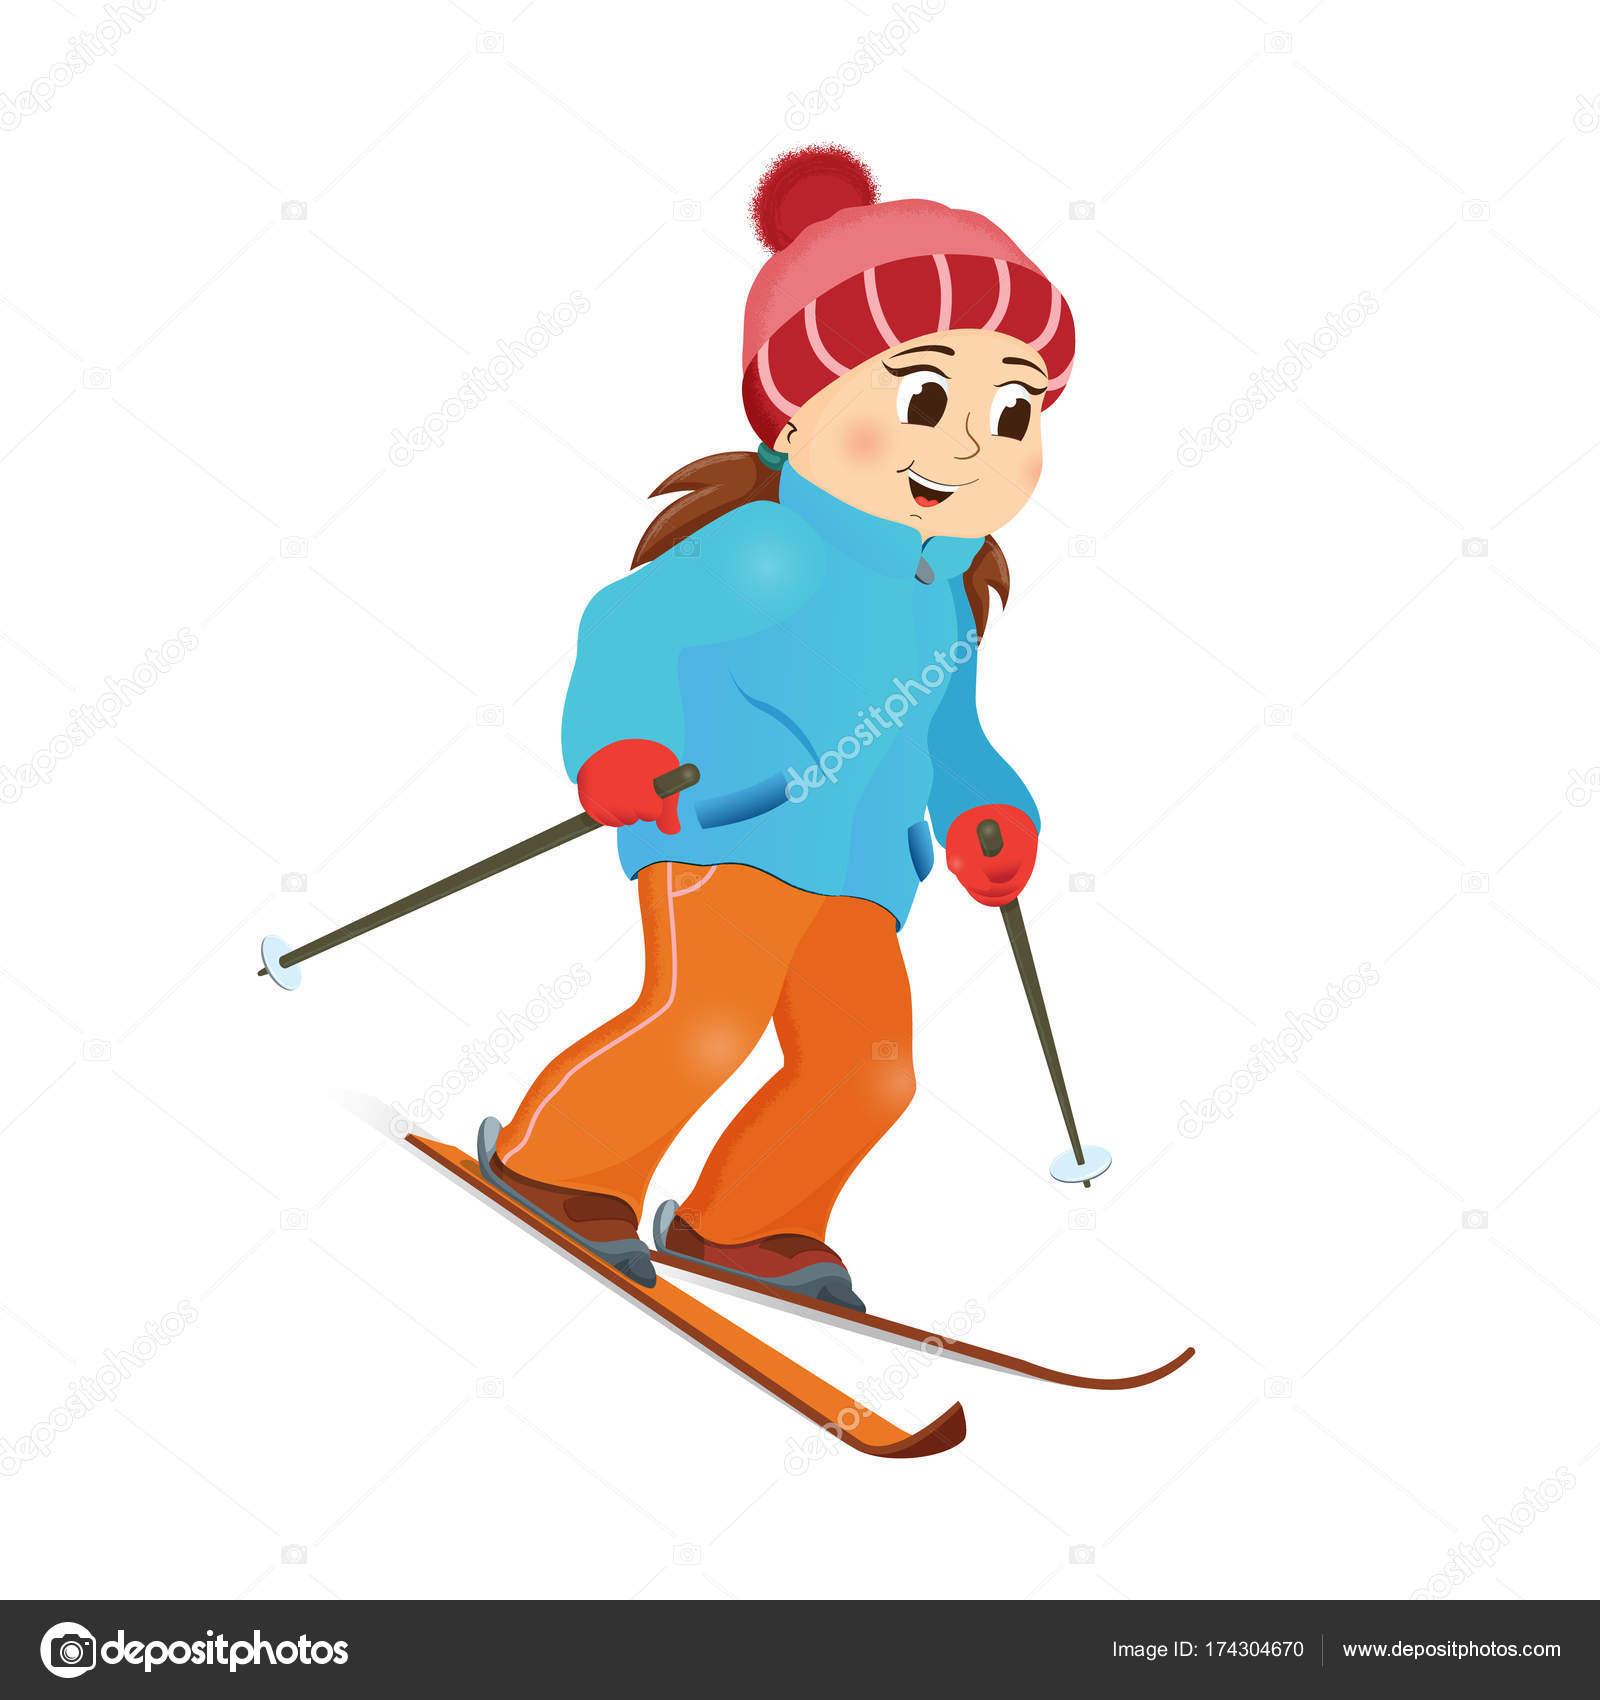 Fille heureuse dr le ski alpin sport d hiver image - Ski alpin dessin ...